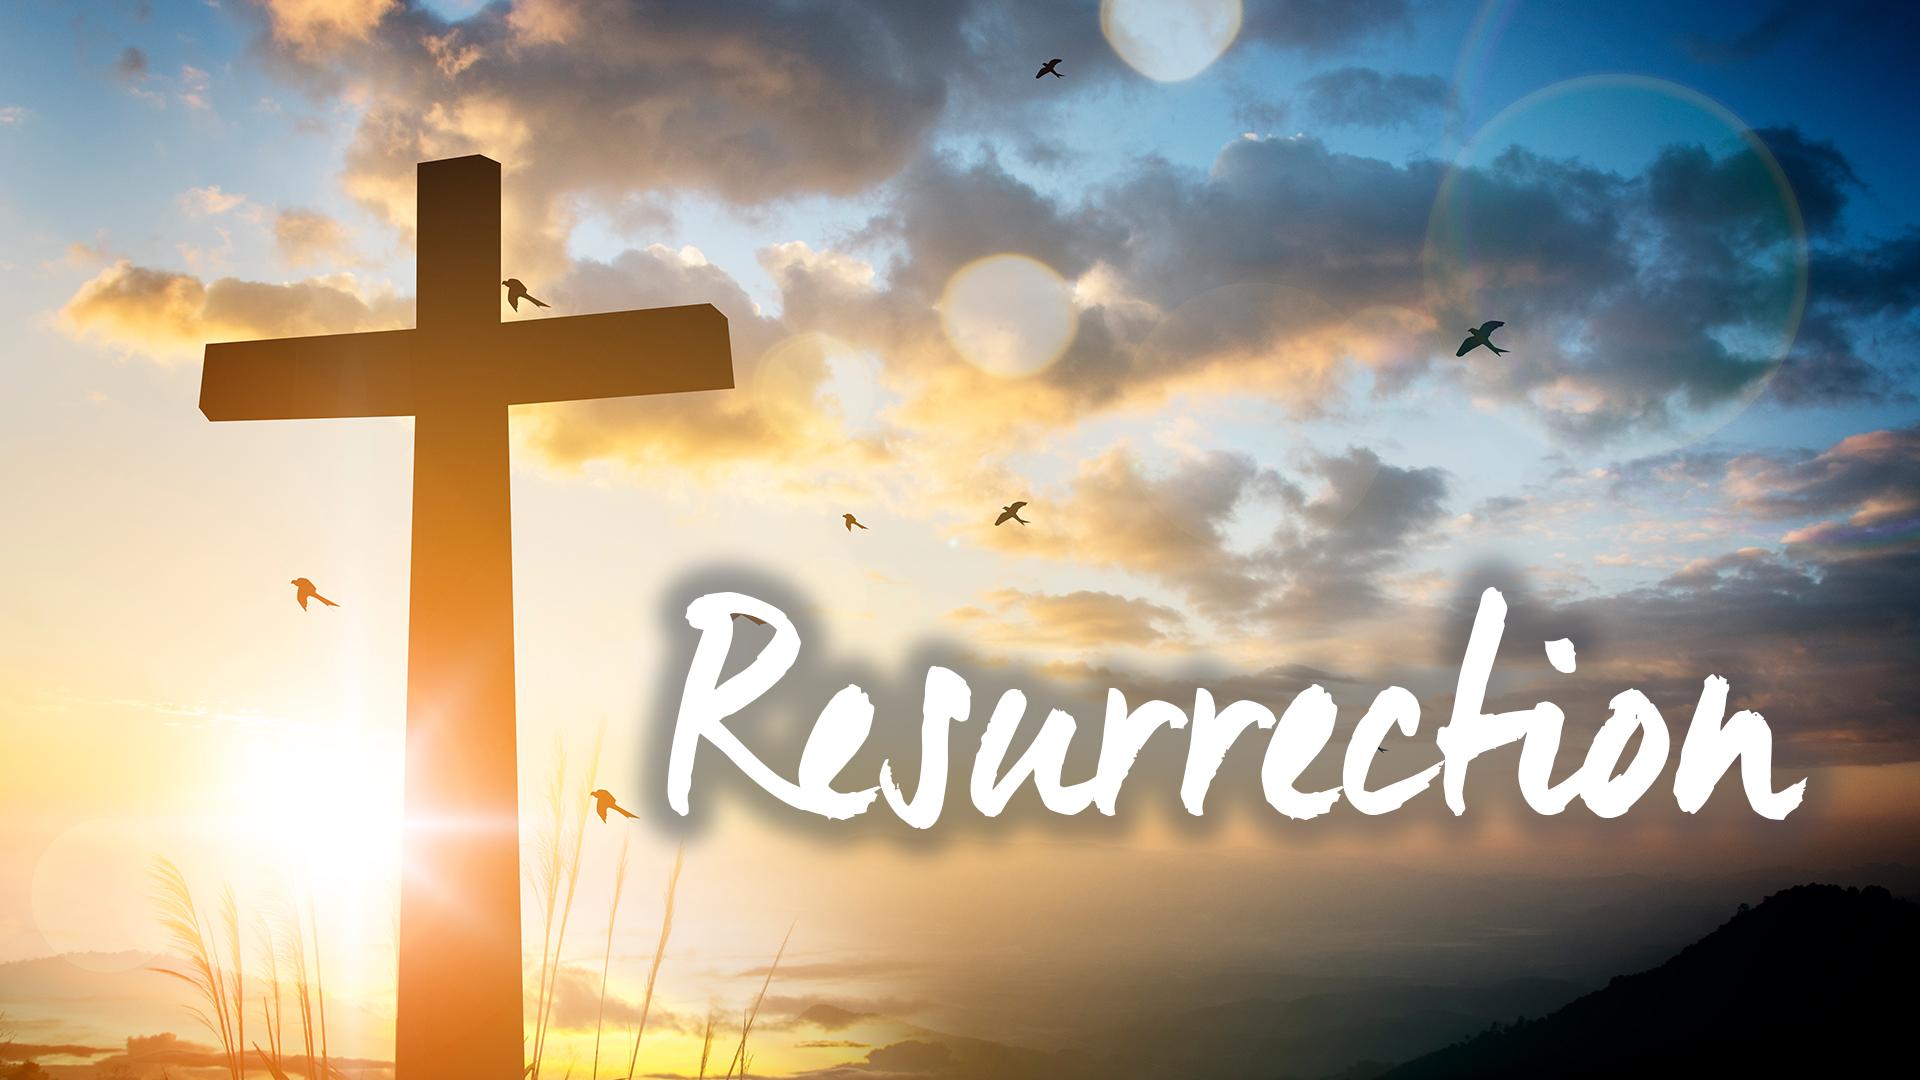 Website sermon - Resurrection.jpg